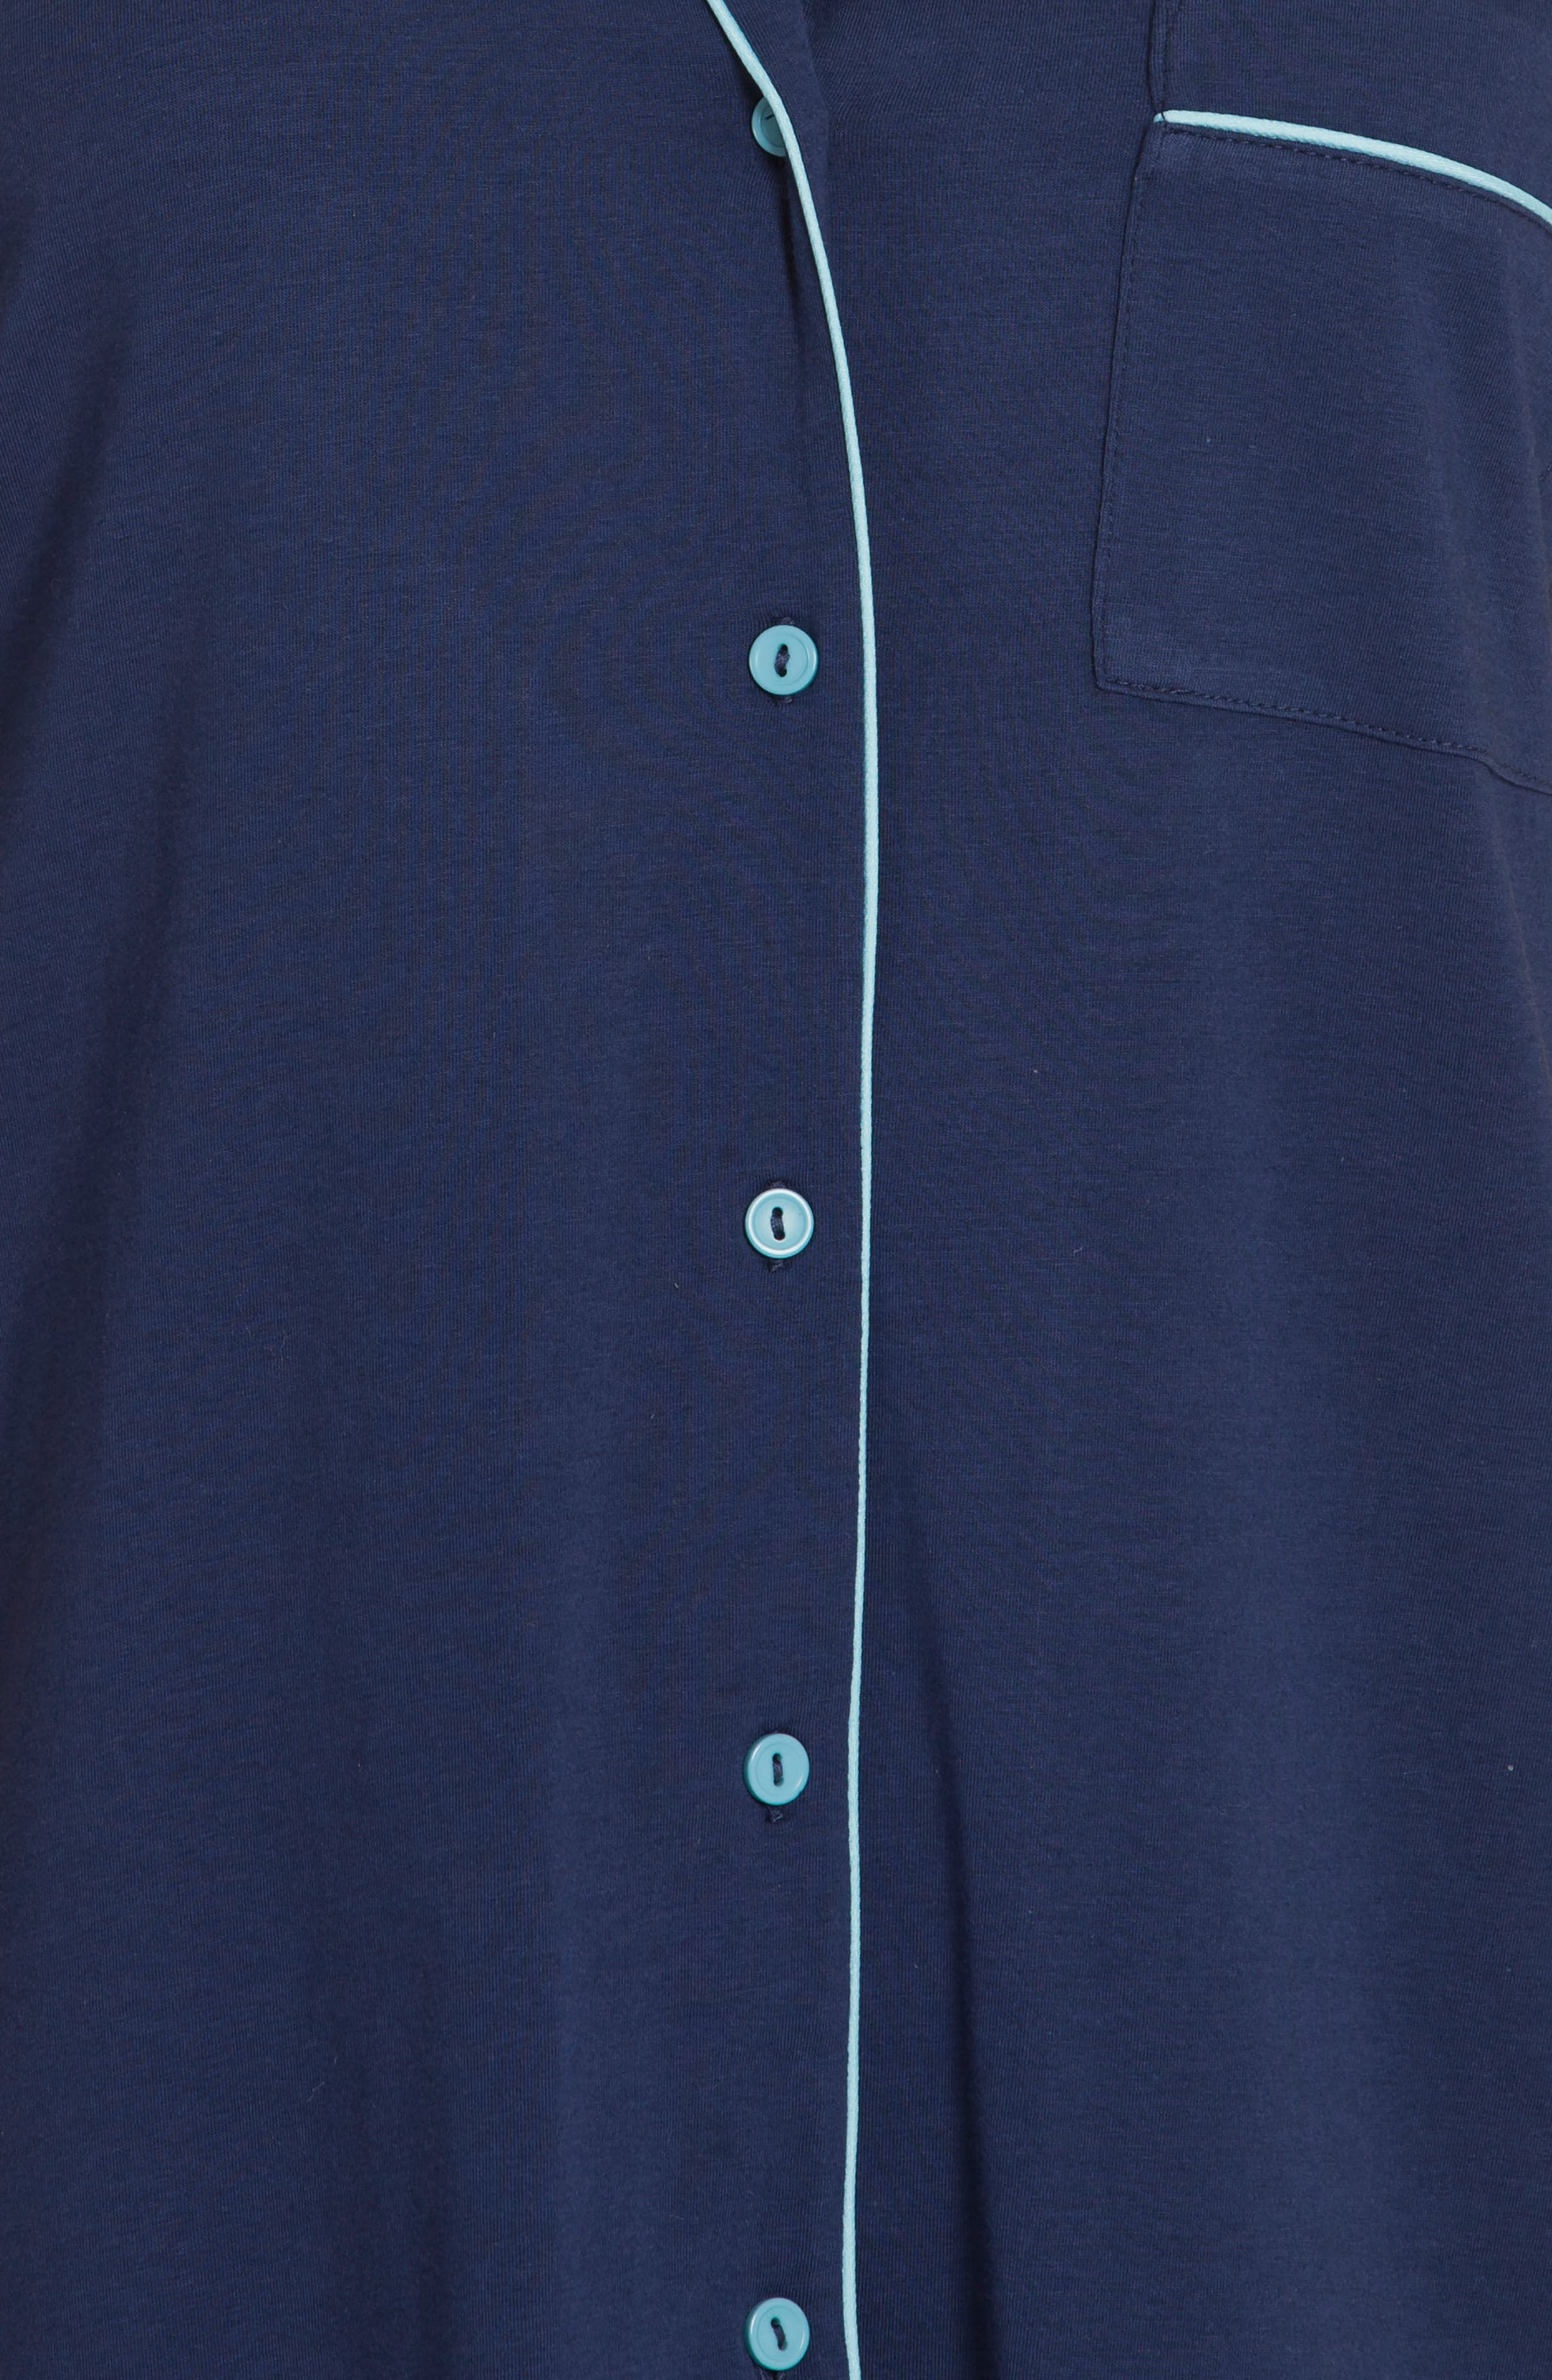 Sleep Shirt,                             Alternate thumbnail 5, color,                             Deep Pacific/ Aqua